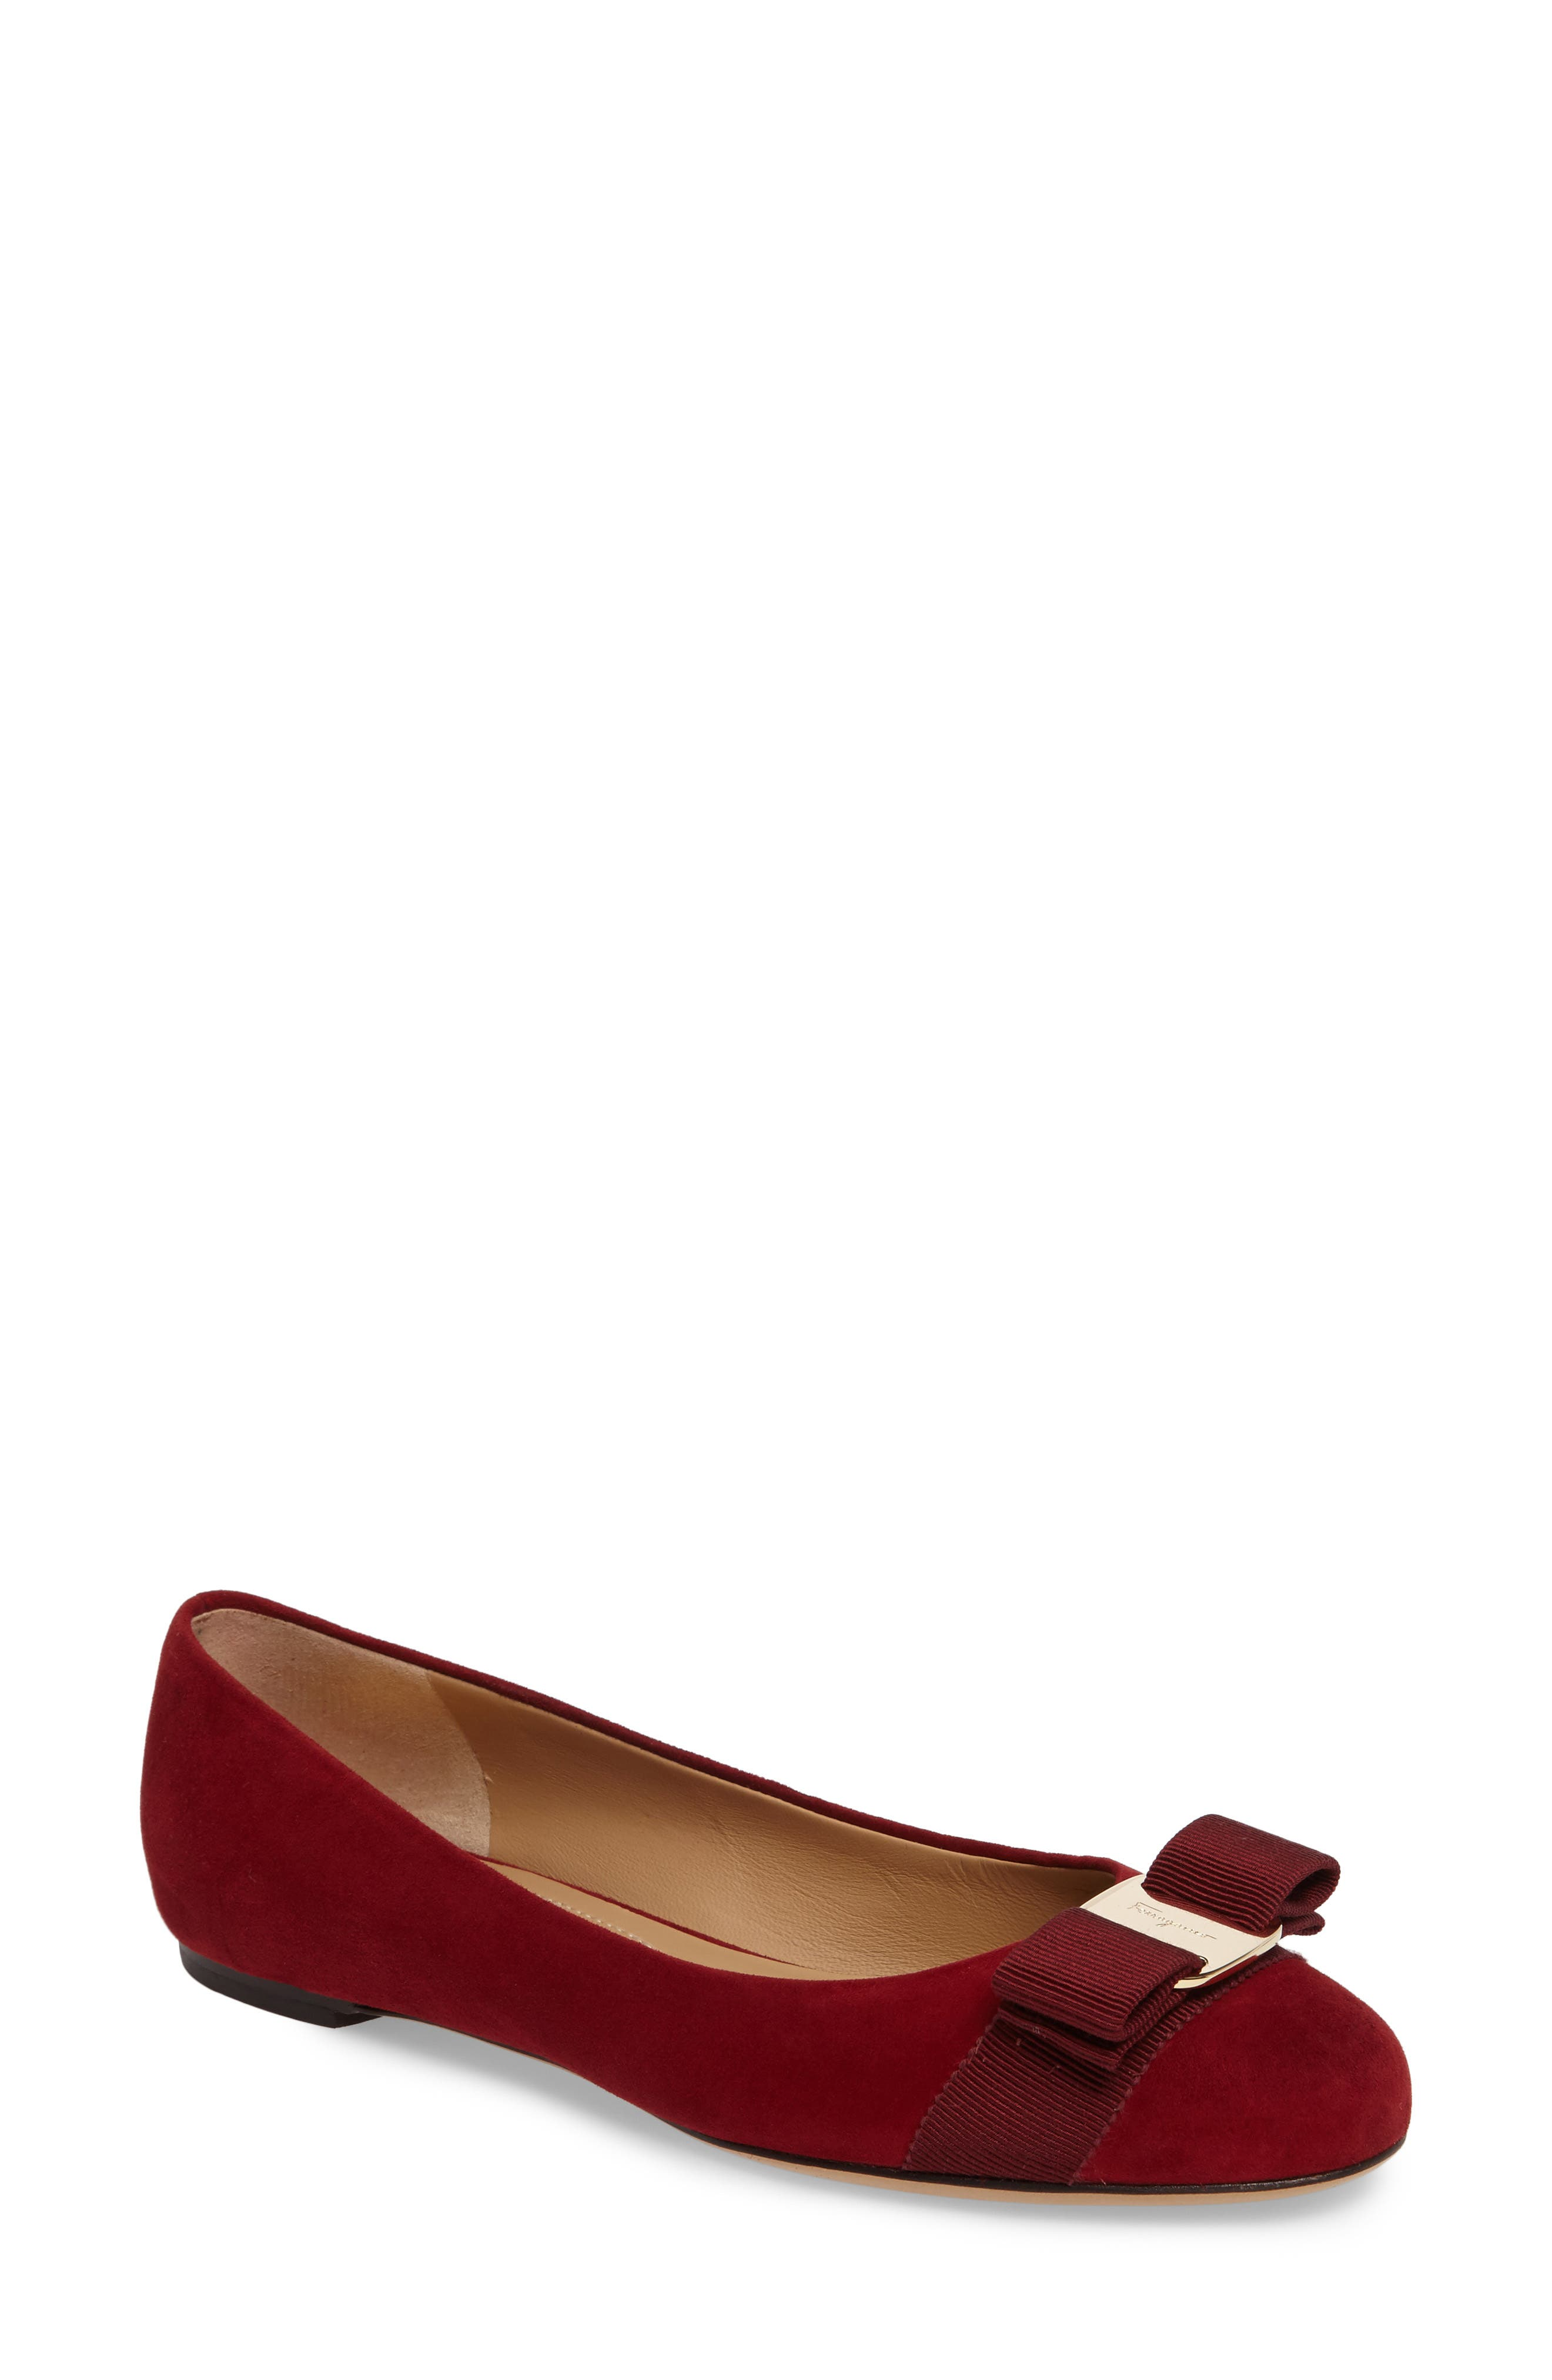 Main Image - Salvatore Ferragamo 'Varina' Leather Flat (Women)